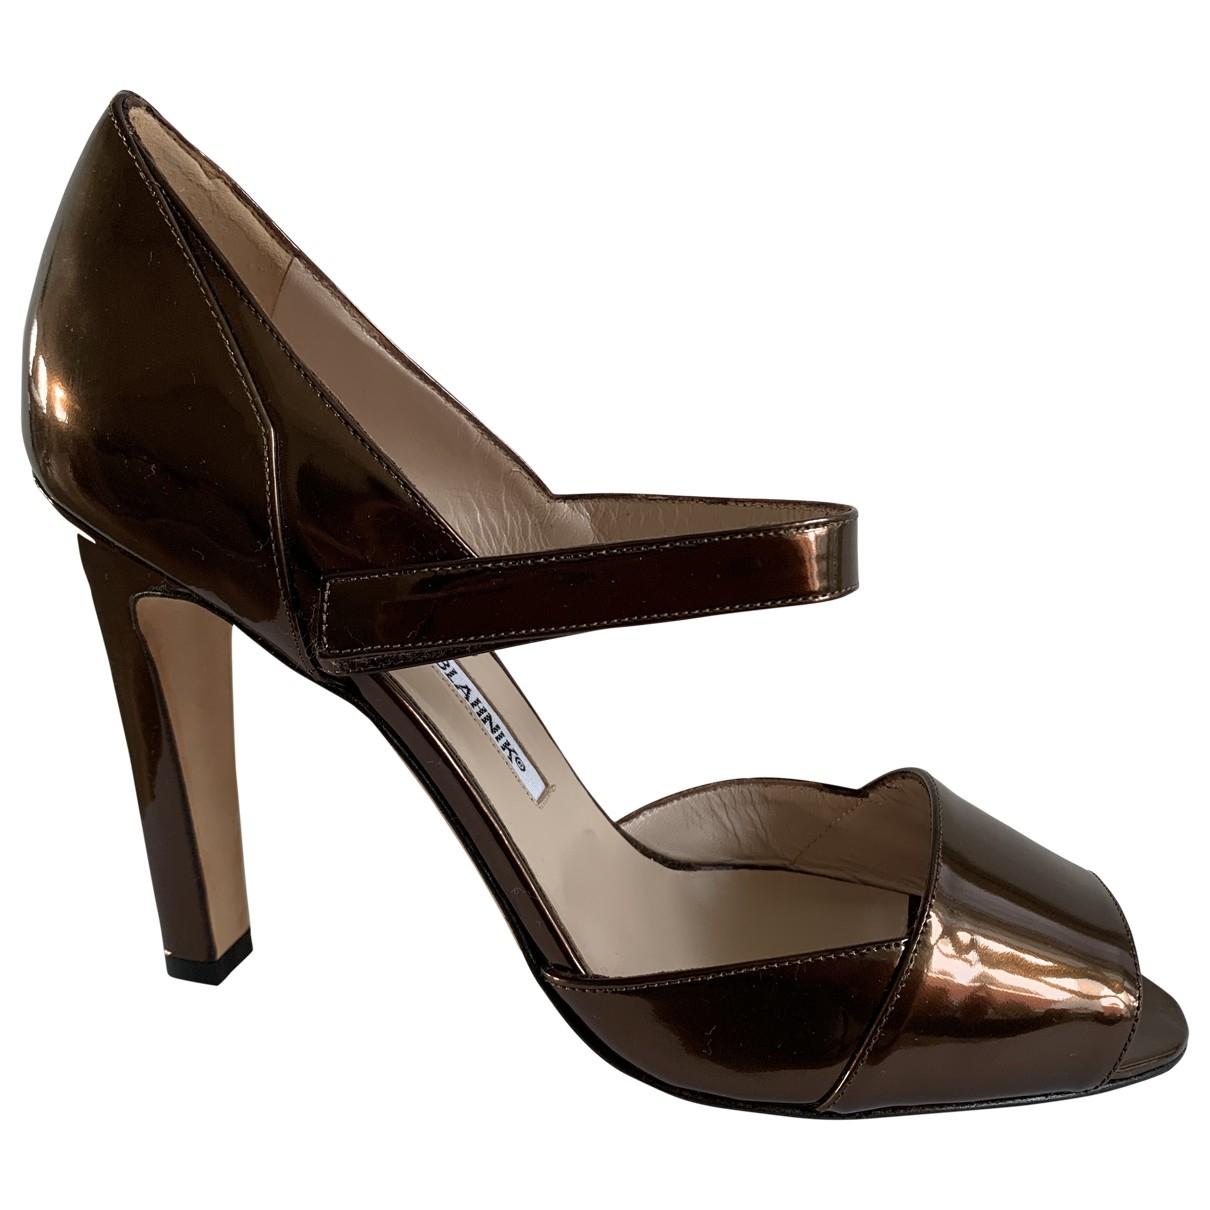 Manolo Blahnik \N Metallic Patent leather Heels for Women 38 EU